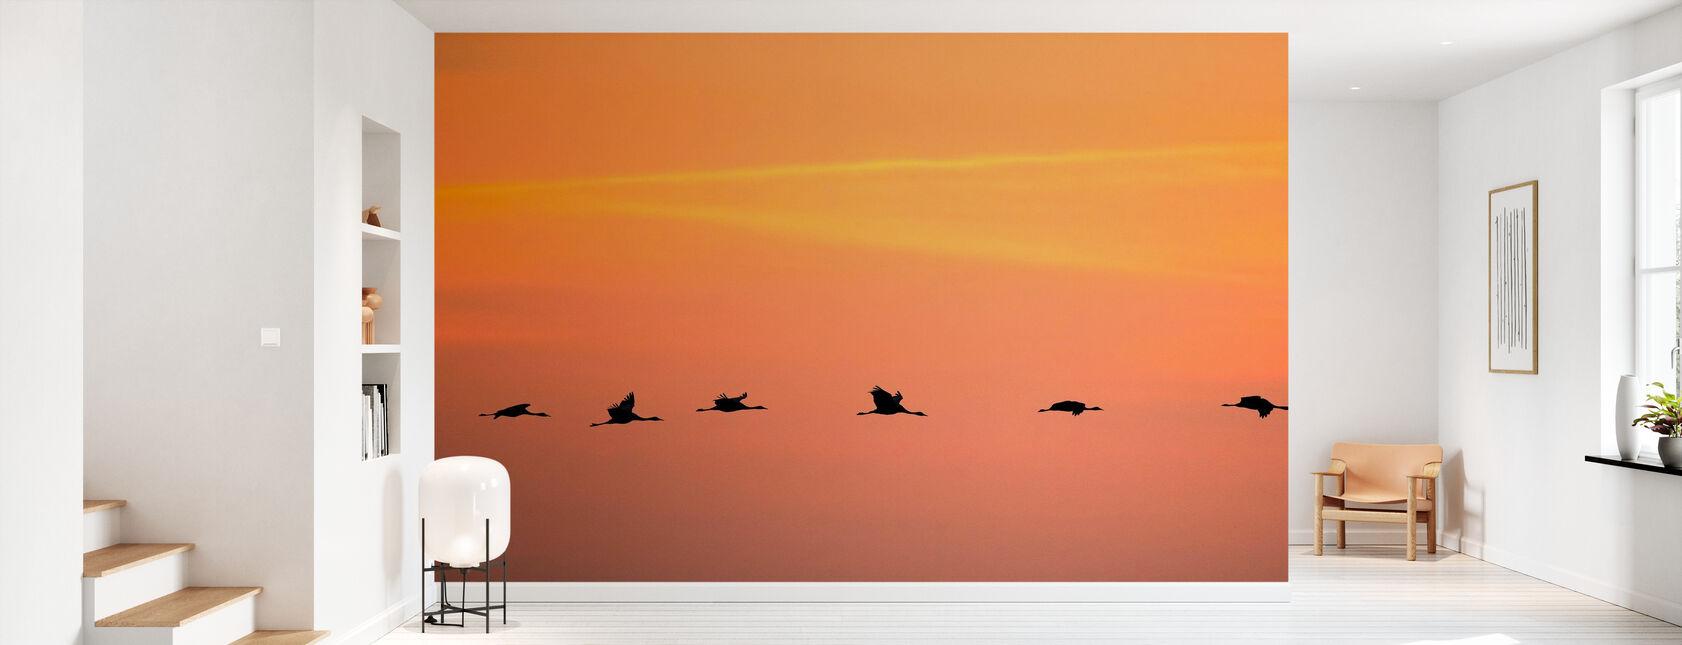 Cranes in Sunrise - Wallpaper - Hallway